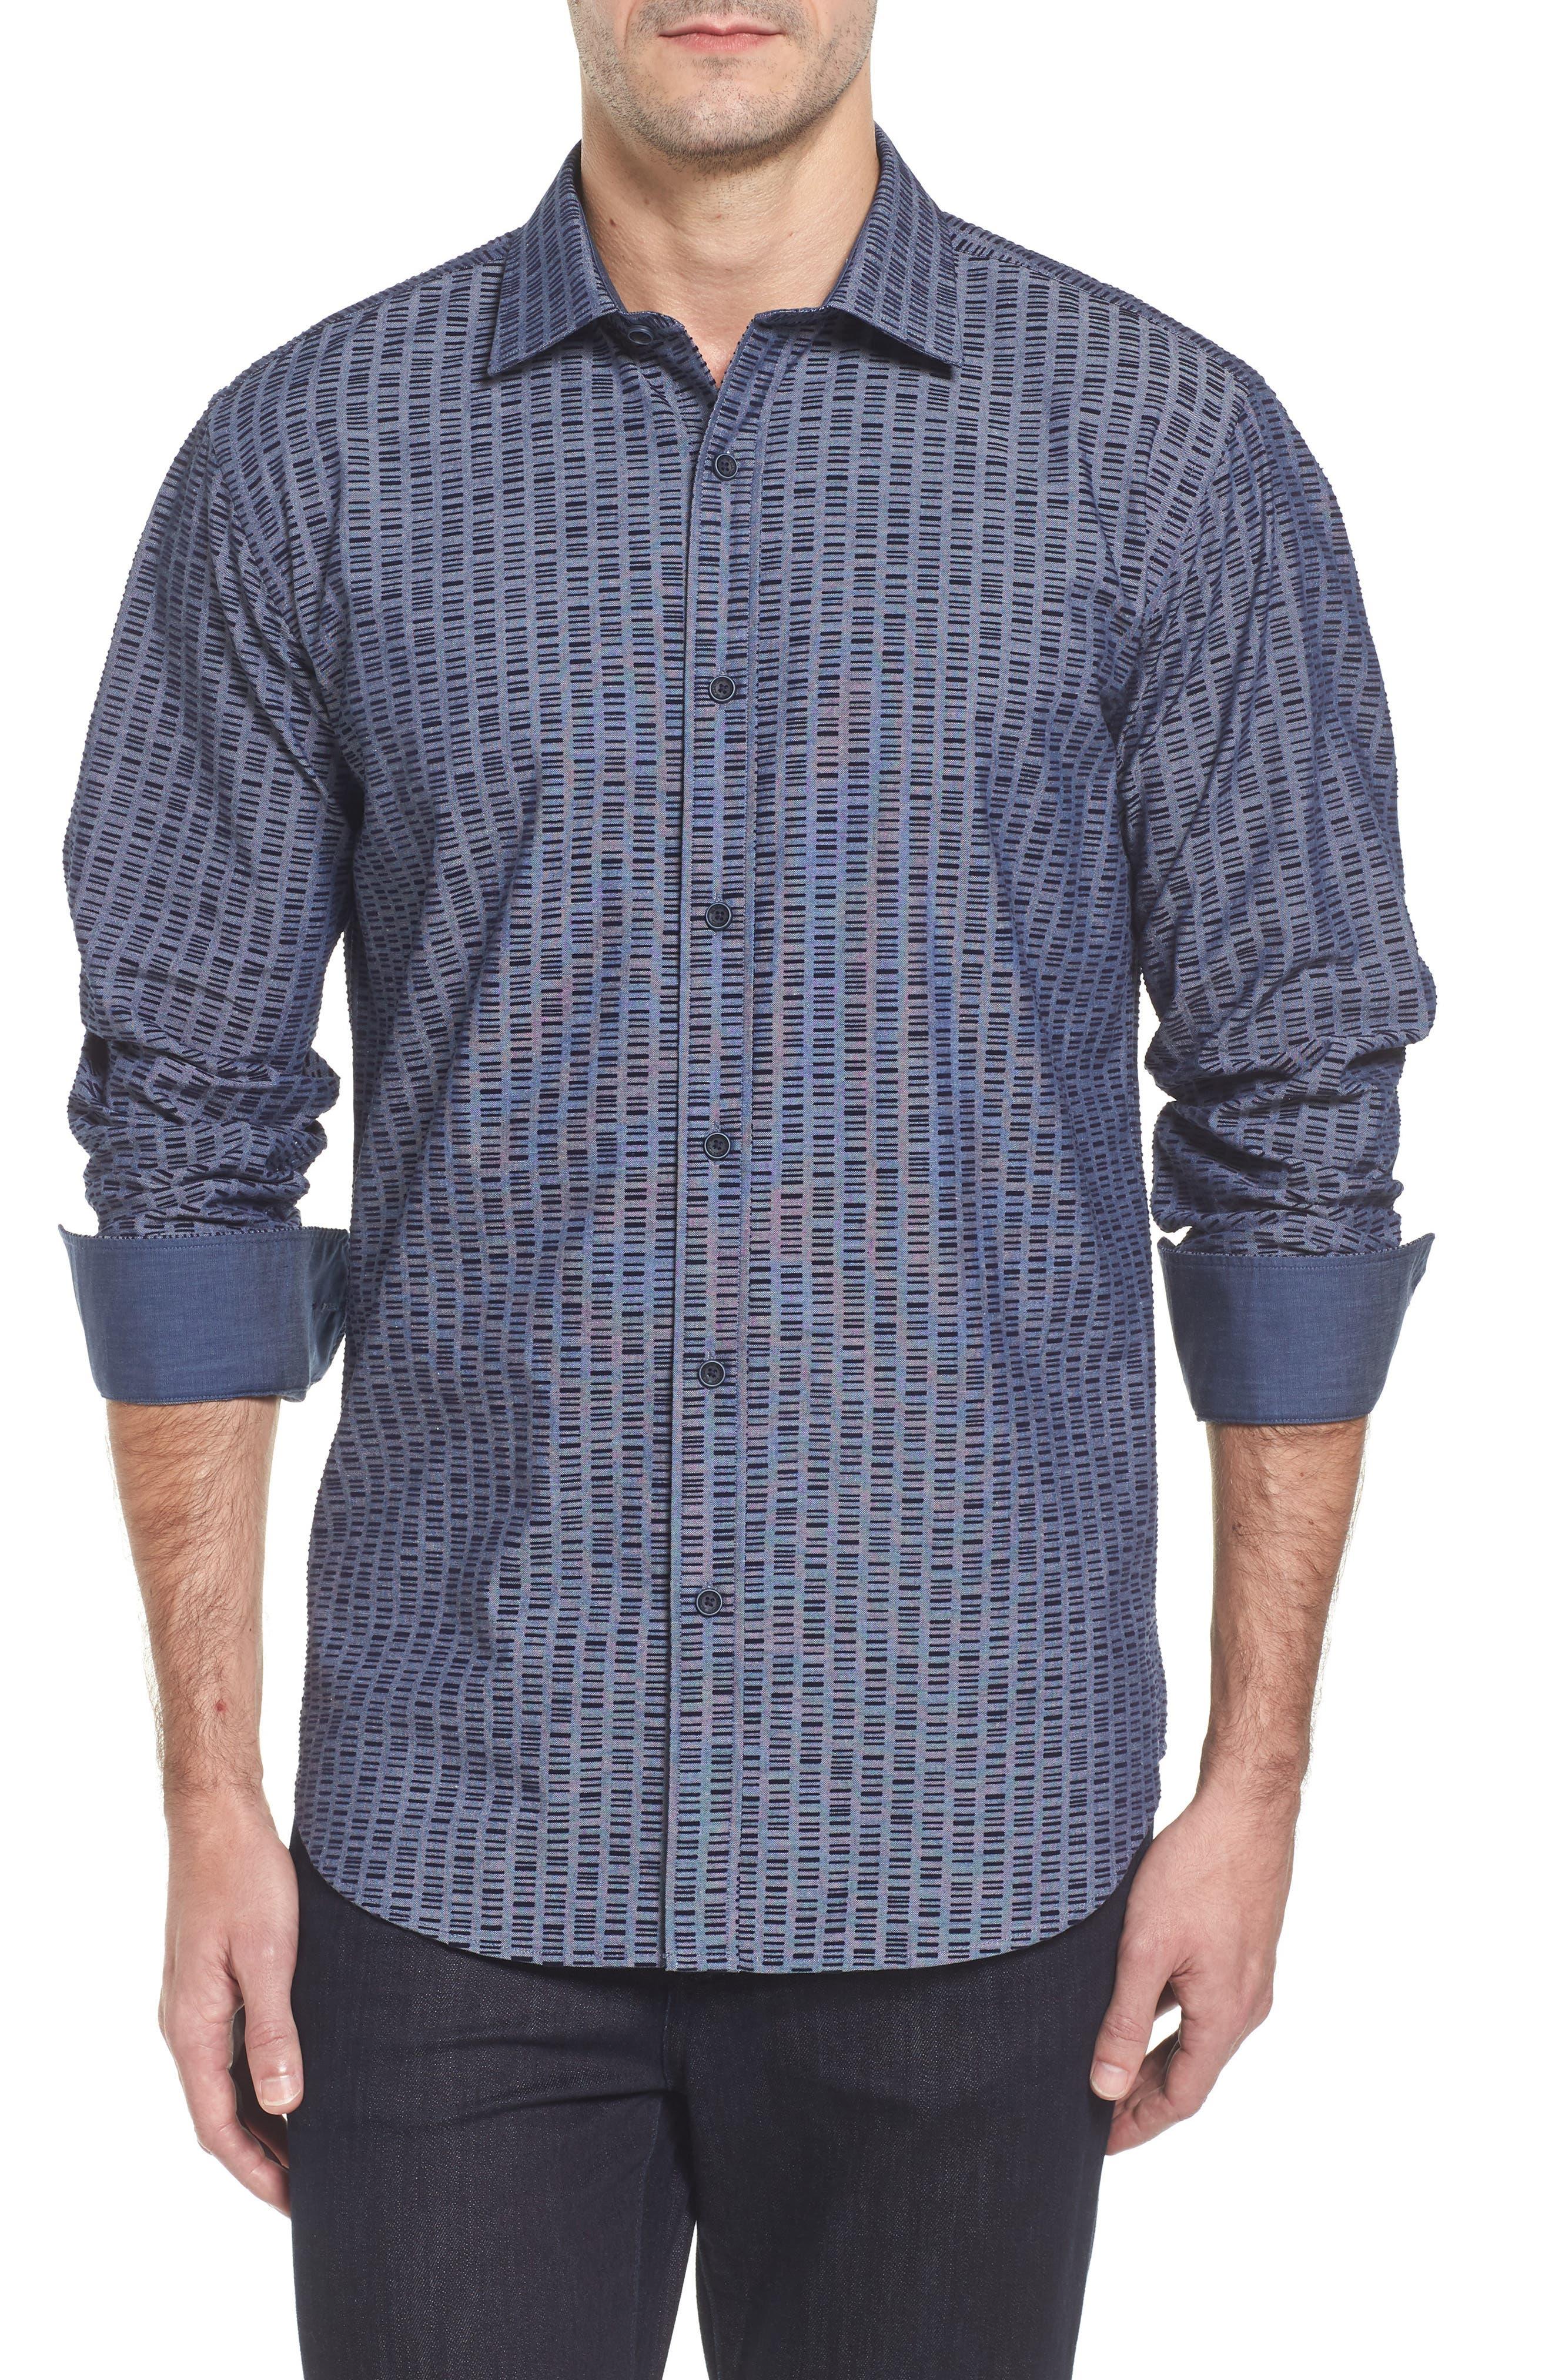 Alternate Image 1 Selected - Bugatchi Slim Fit Flock Print Sport Shirt